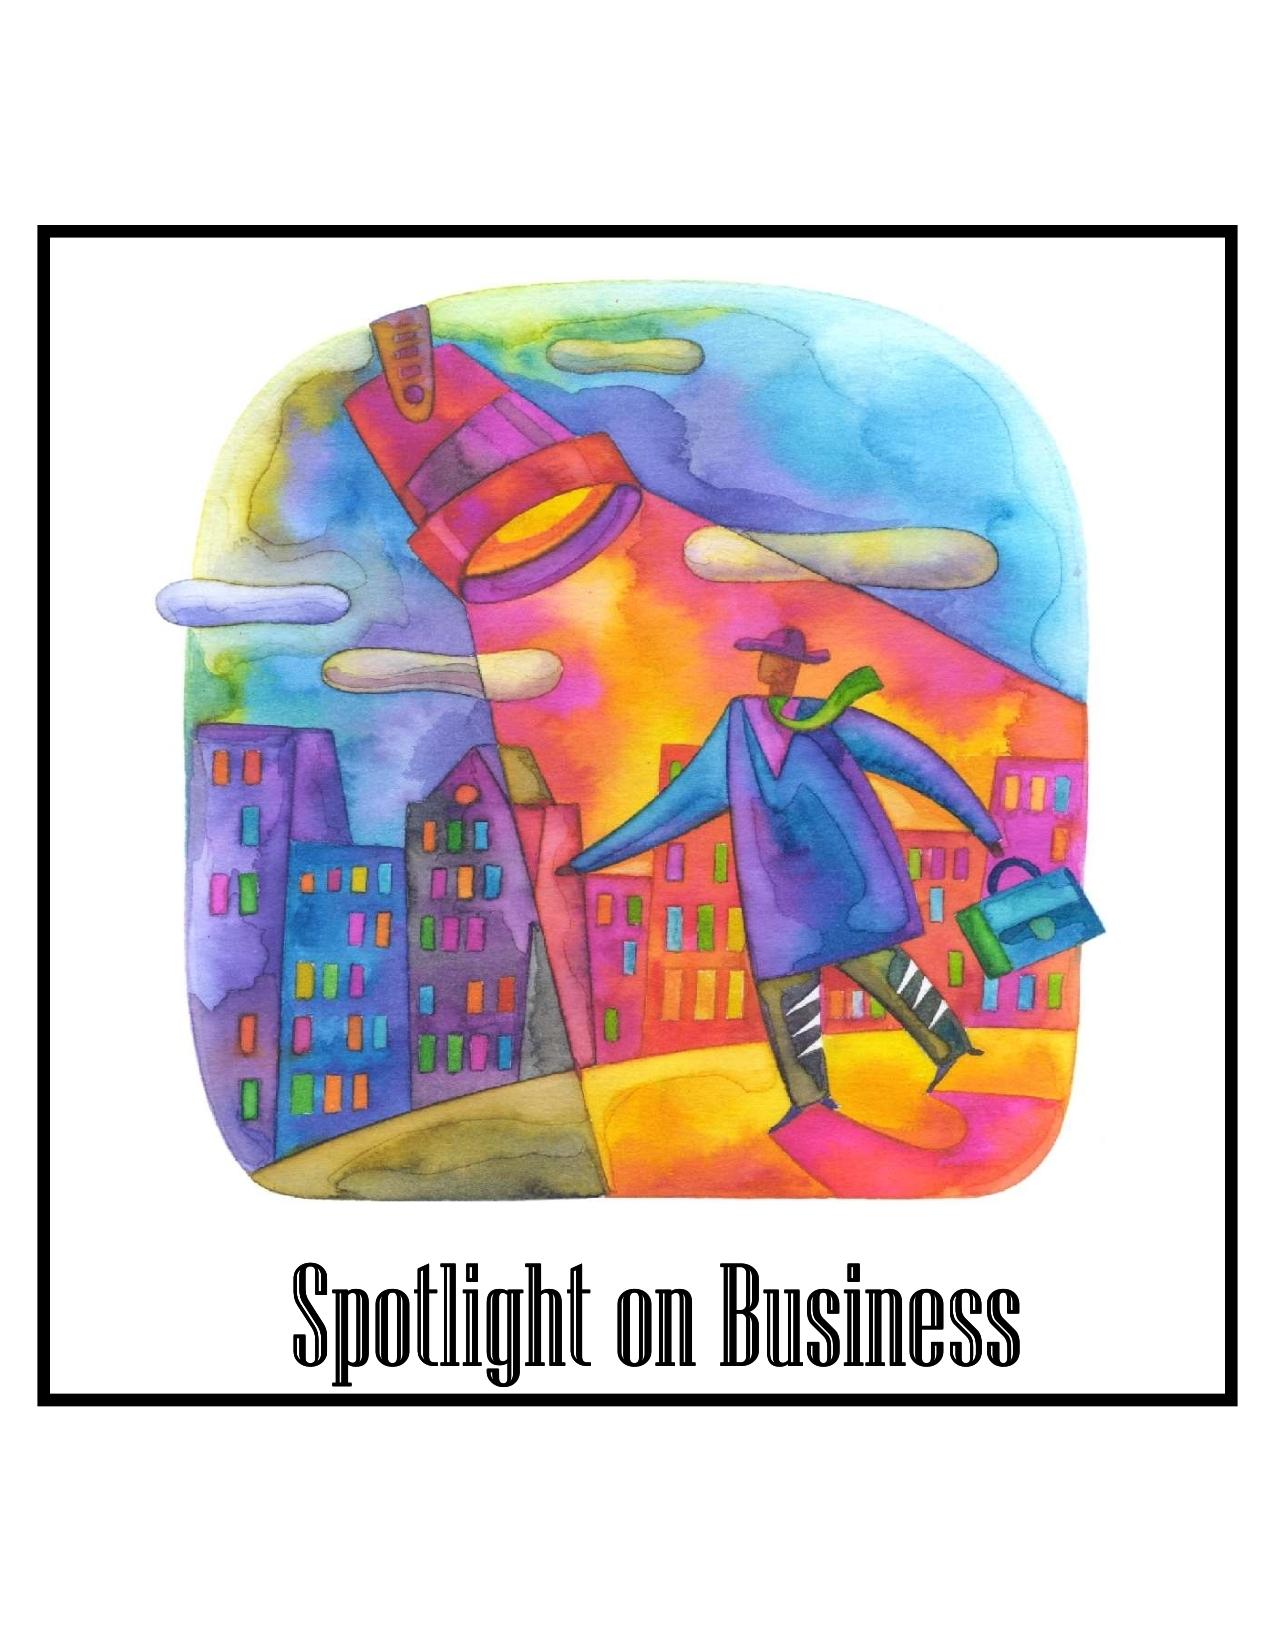 401308d5a8eda81ba88f_spotlight_on_business_graphic.jpg